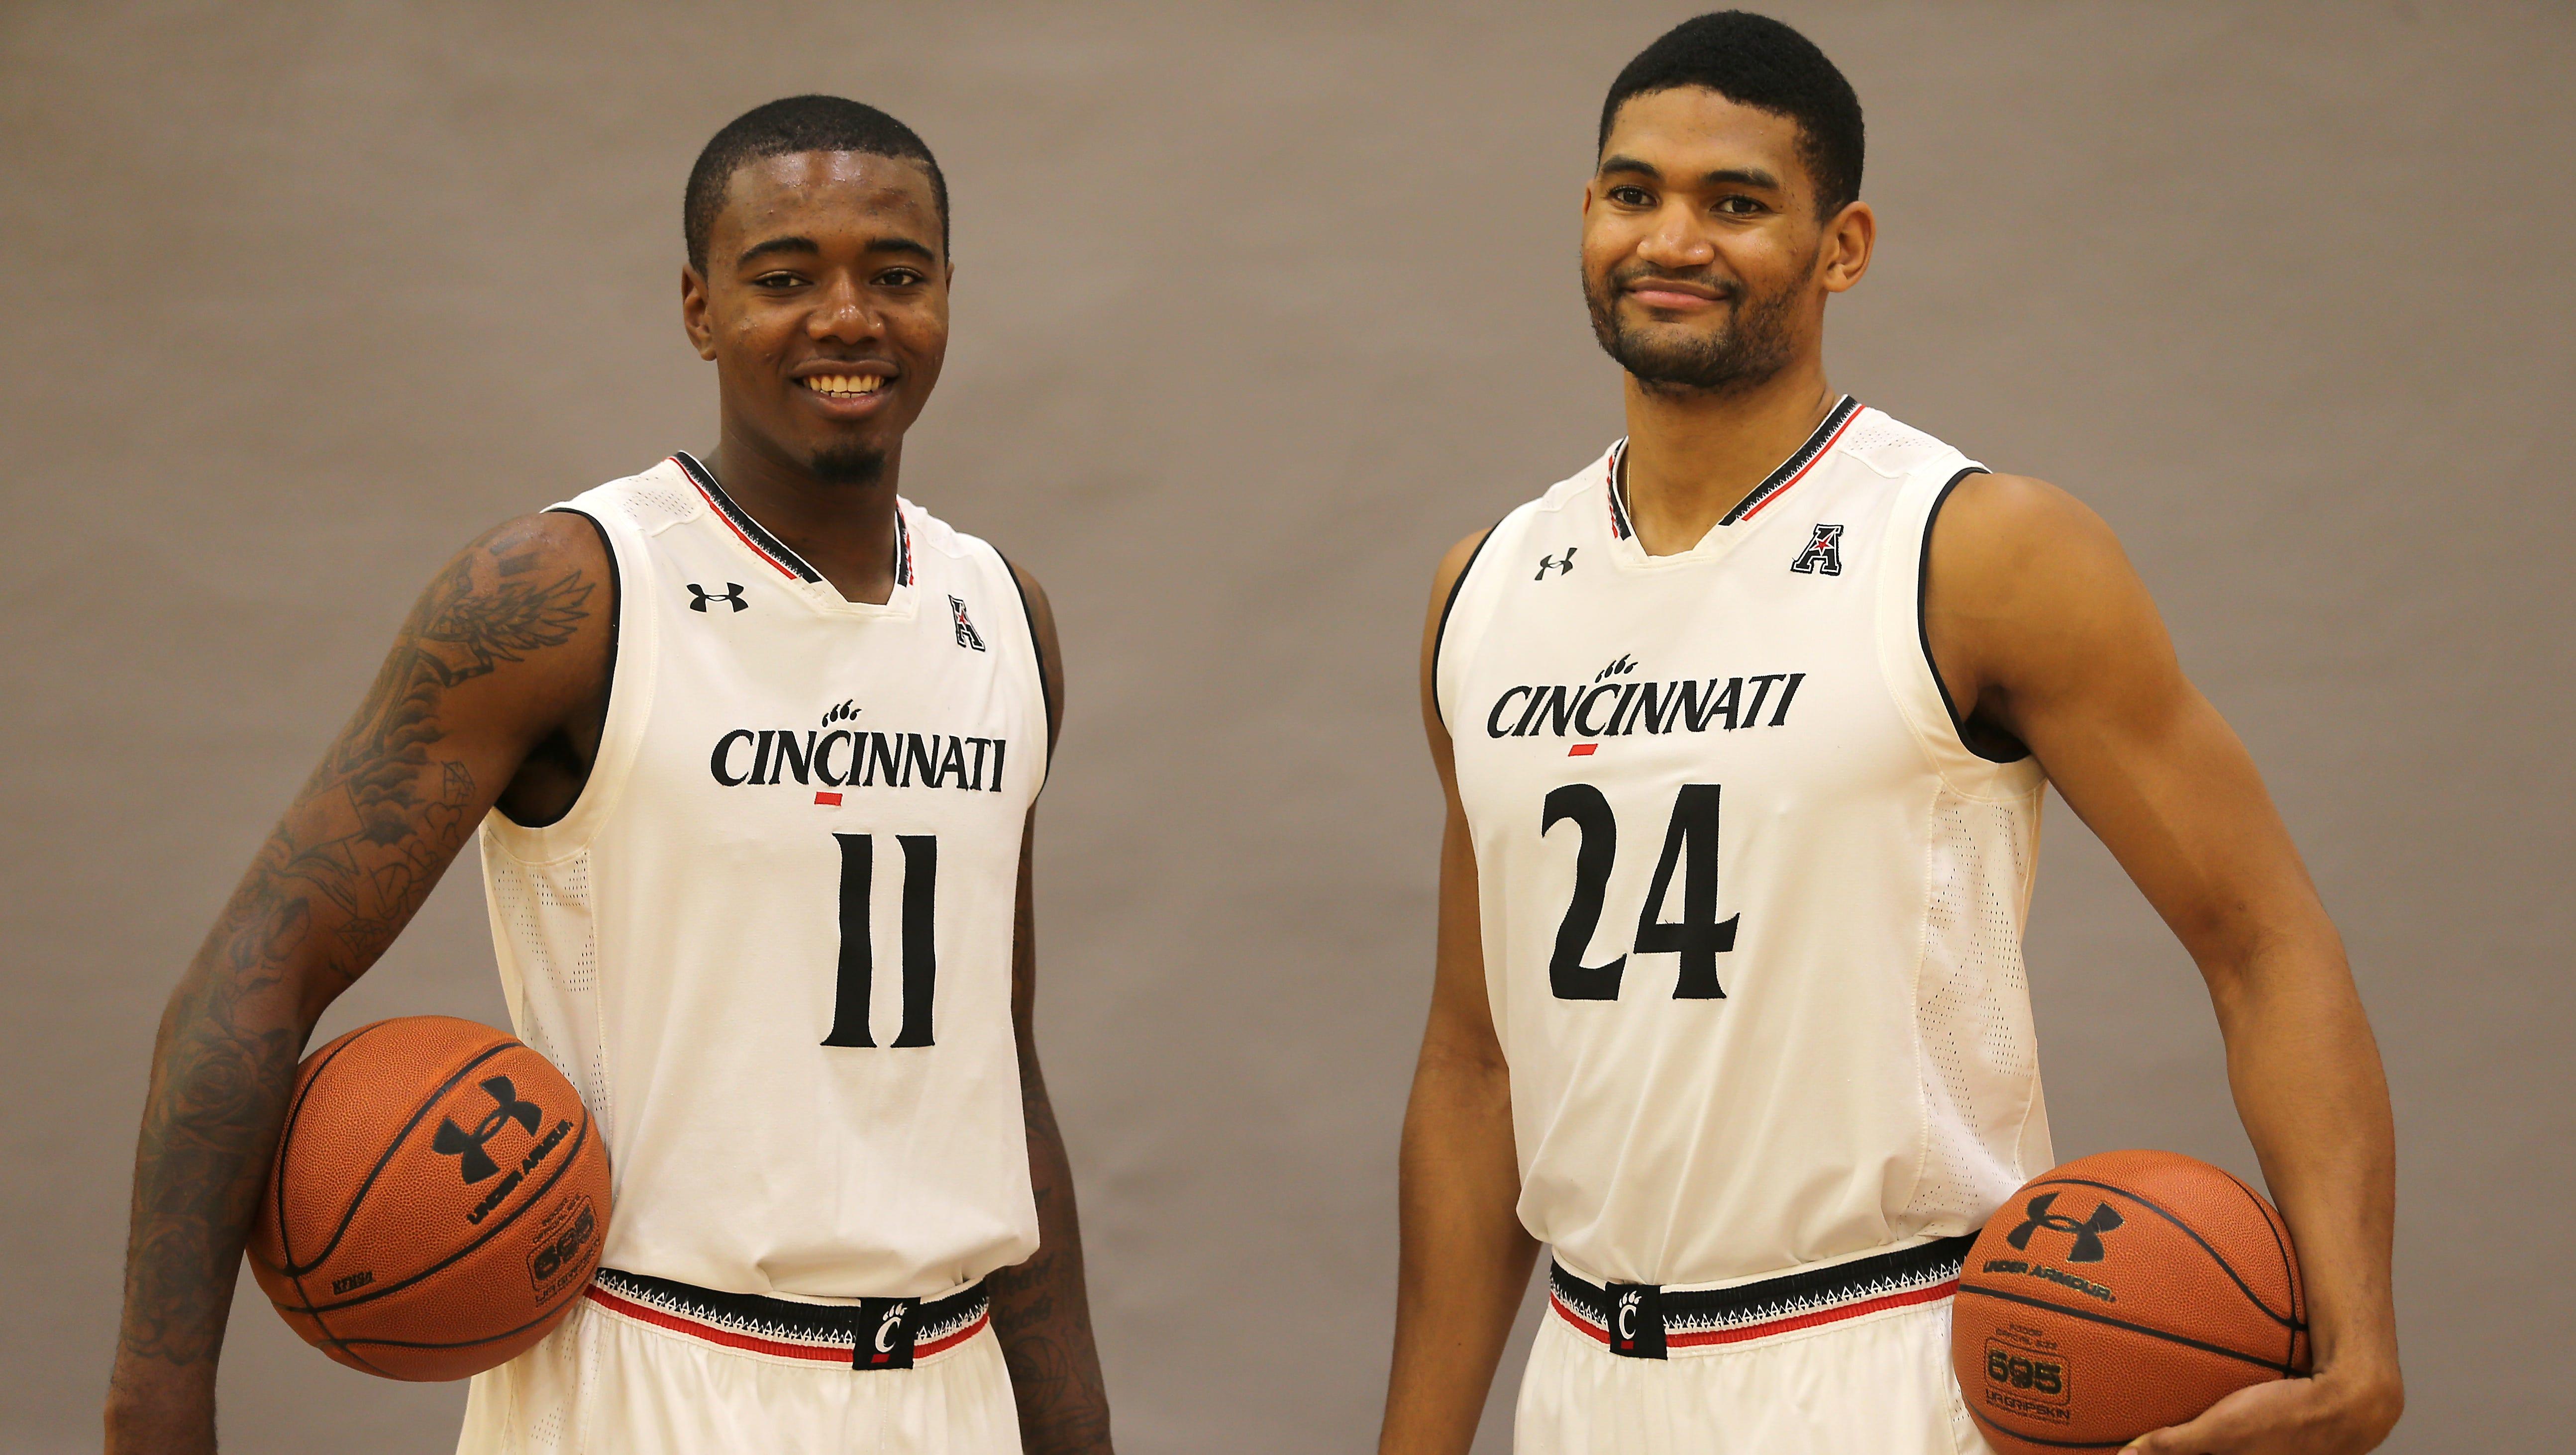 UC basketball: Yes, rims are same height at NKU